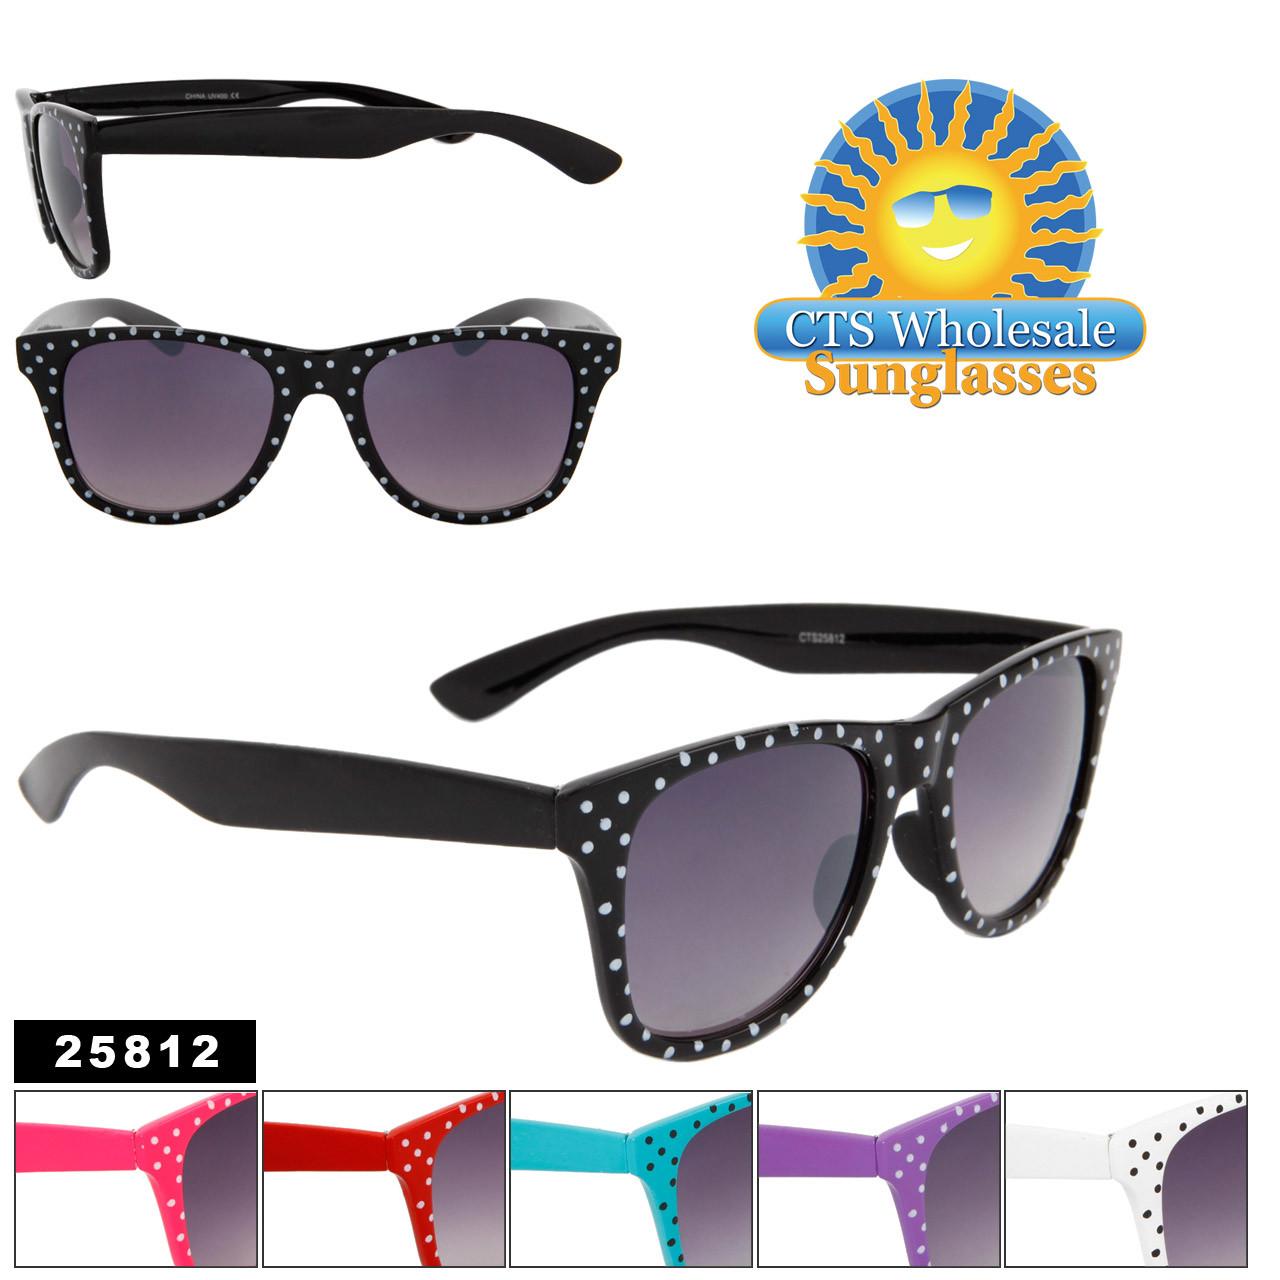 New Polka Dot Classic Sunglasses! Item 25812